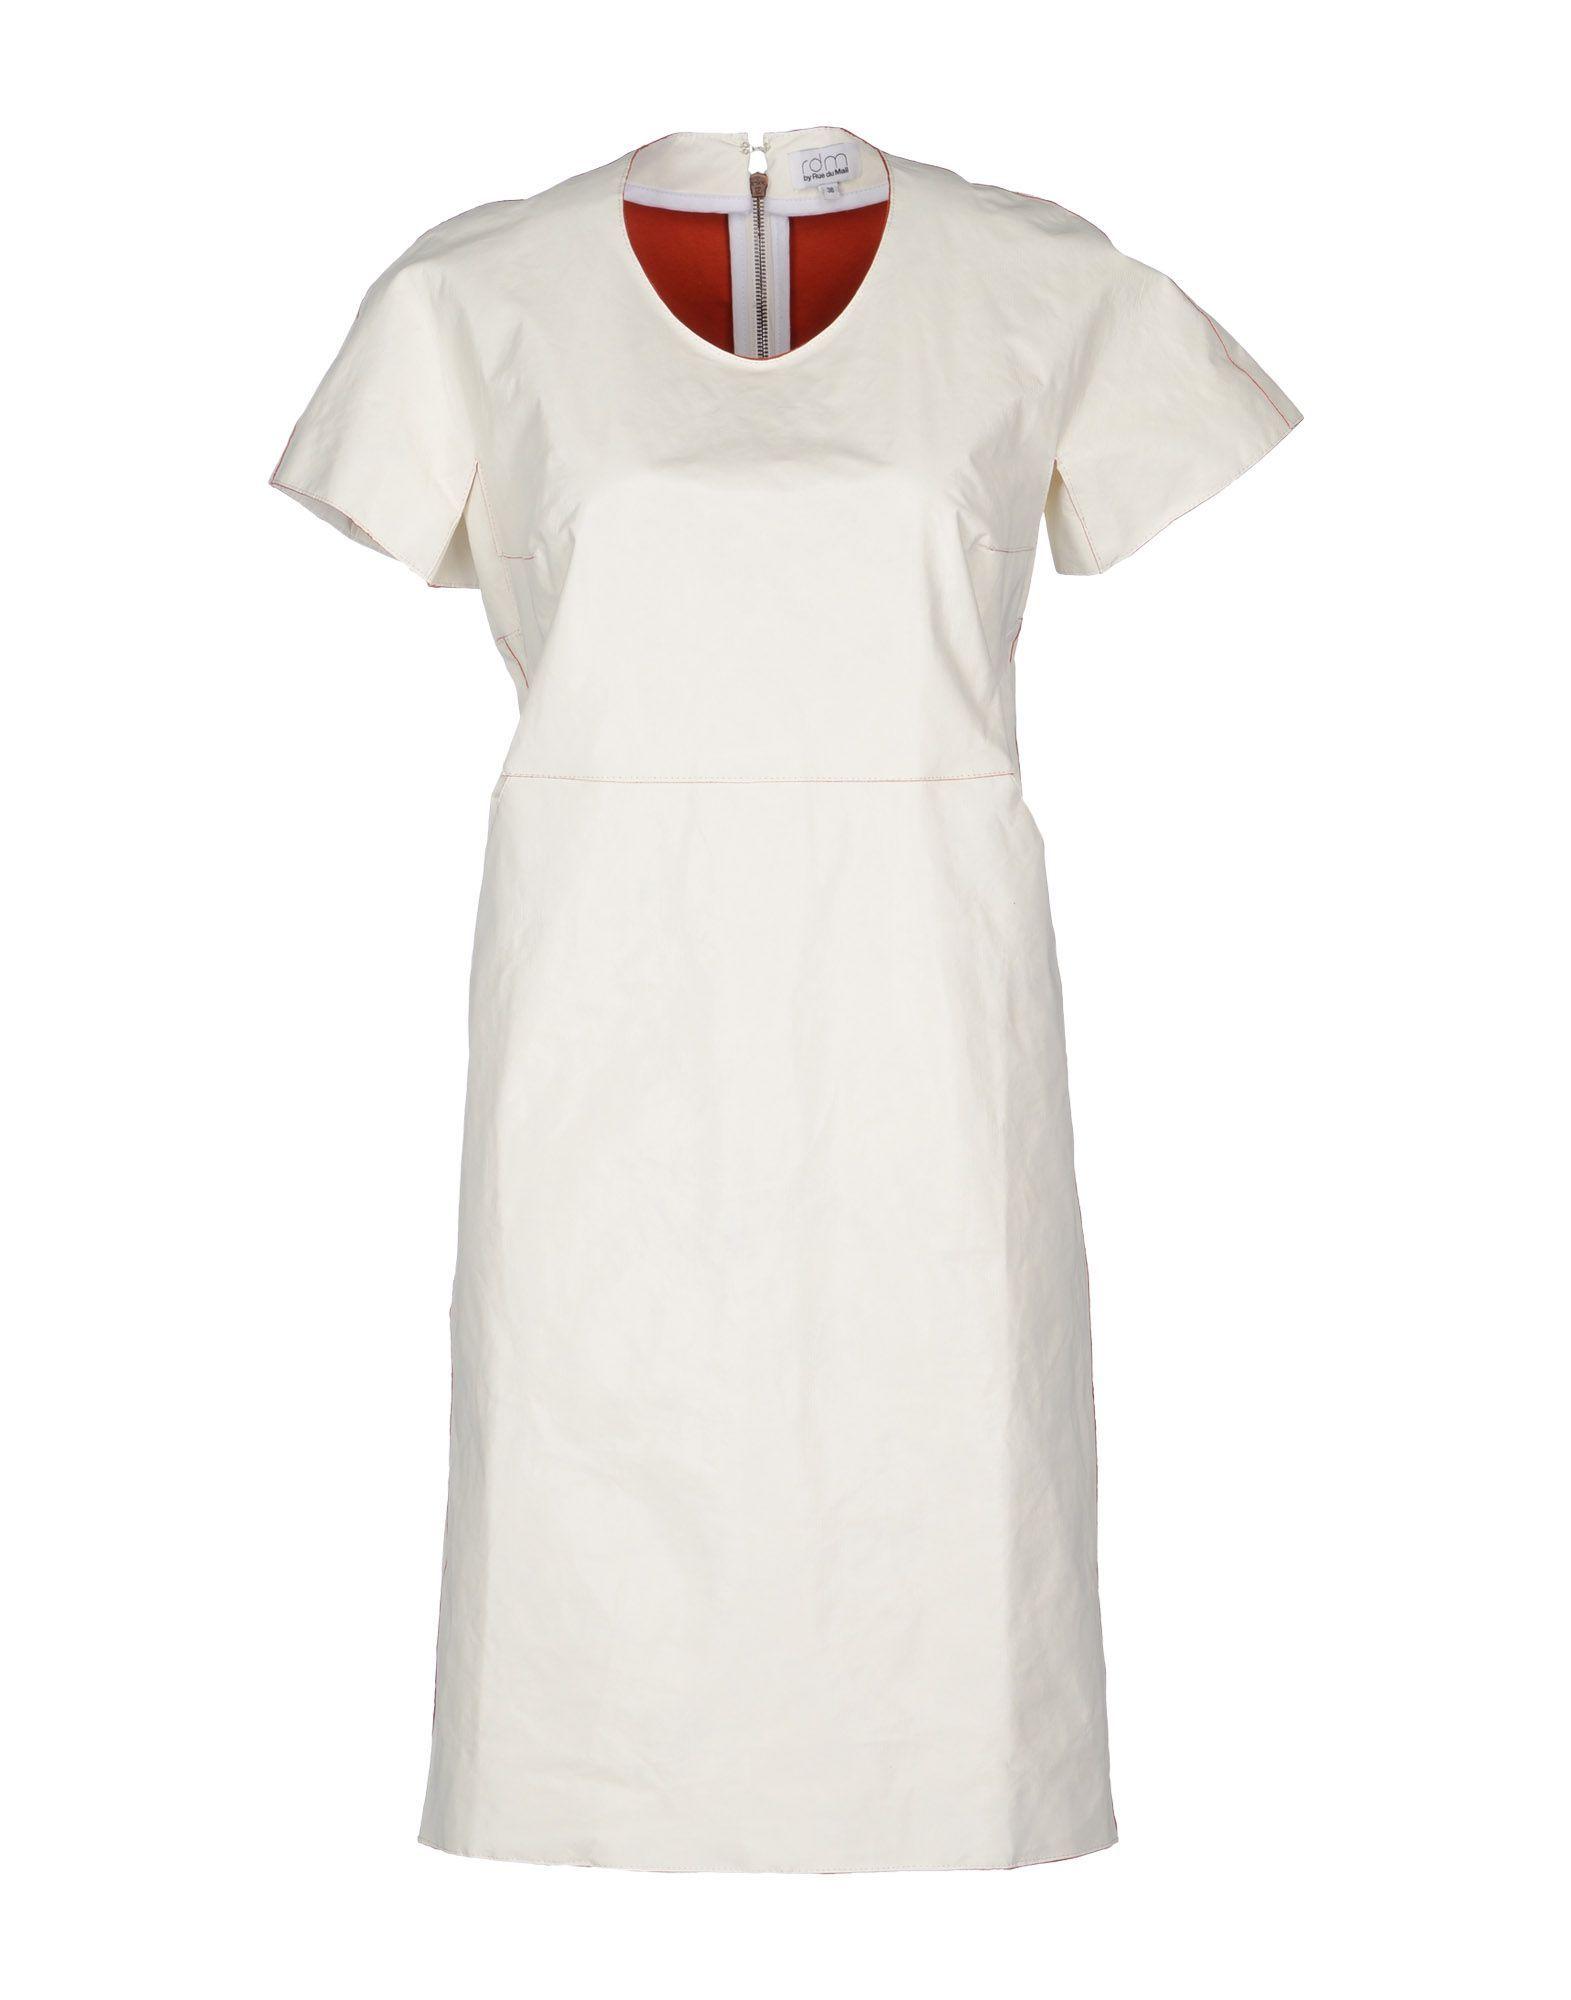 Dress Rdm By Rue Du Mail White Women's Polyurethane